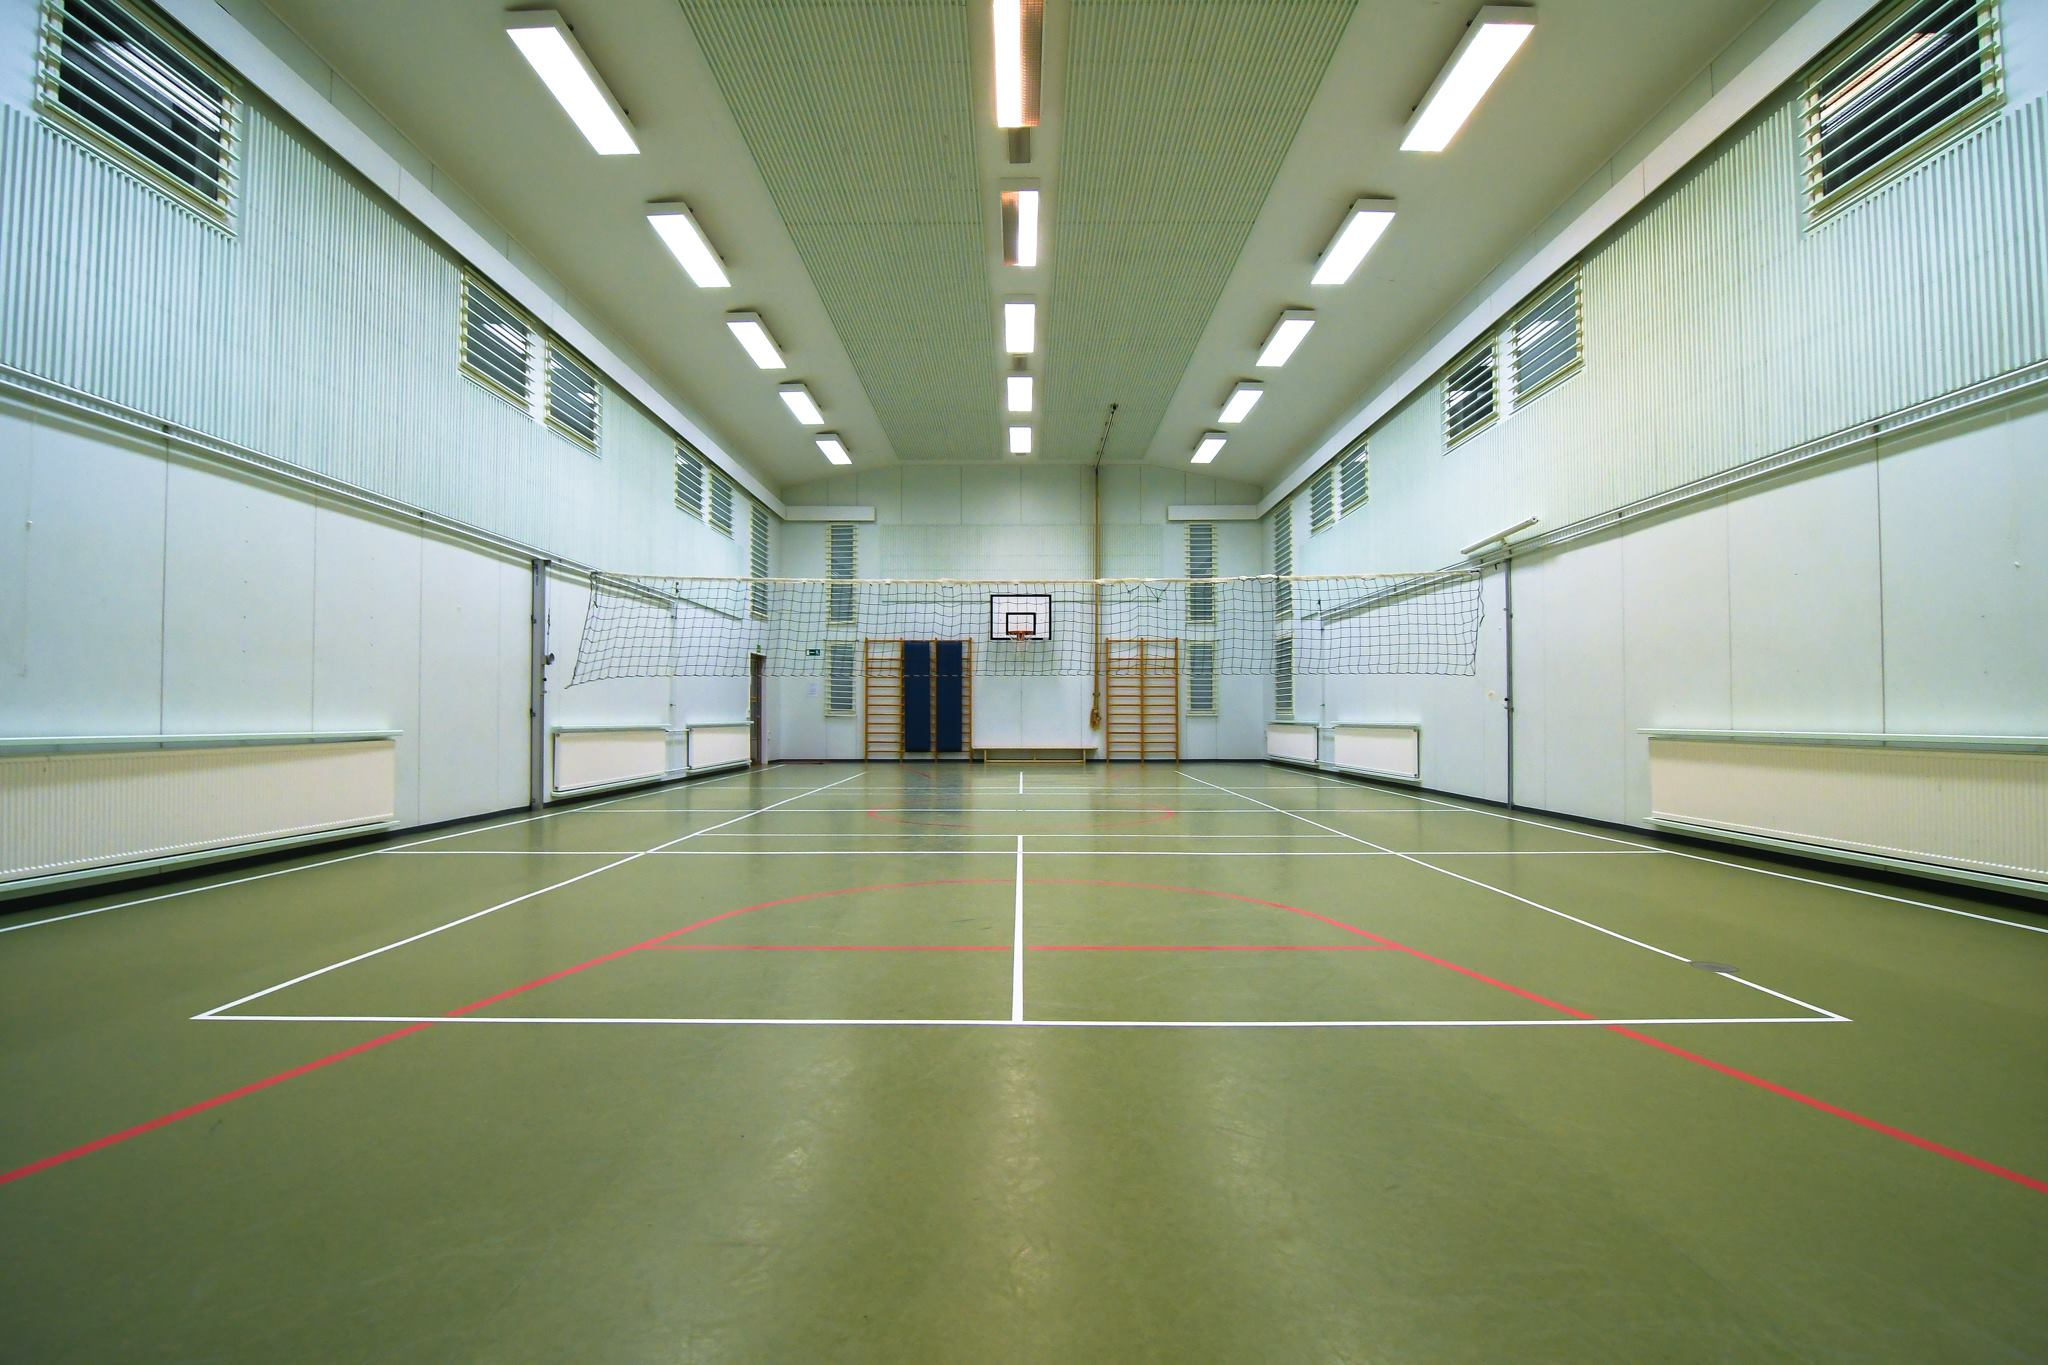 sports-hall-001.jpg